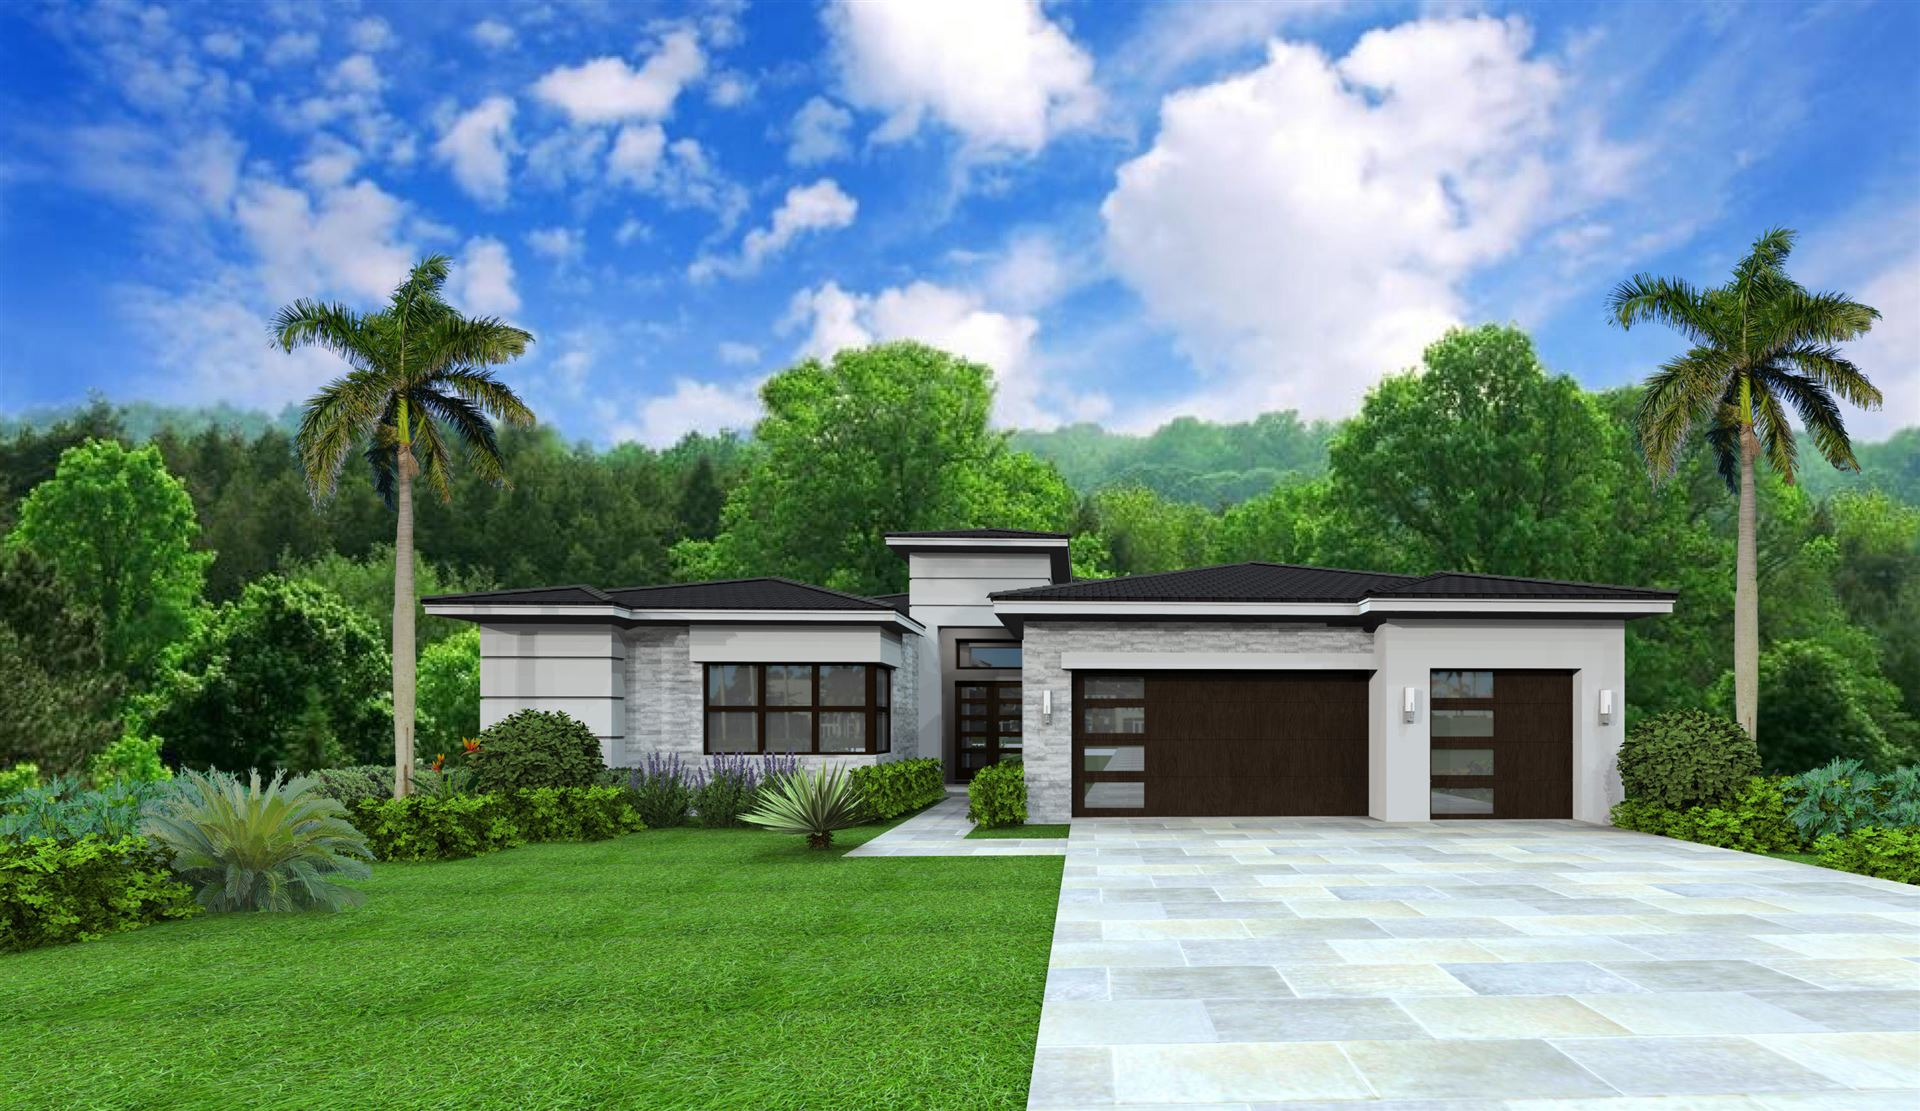 17424 Rosella Road, Boca Raton, FL 33496 - #: RX-10647860